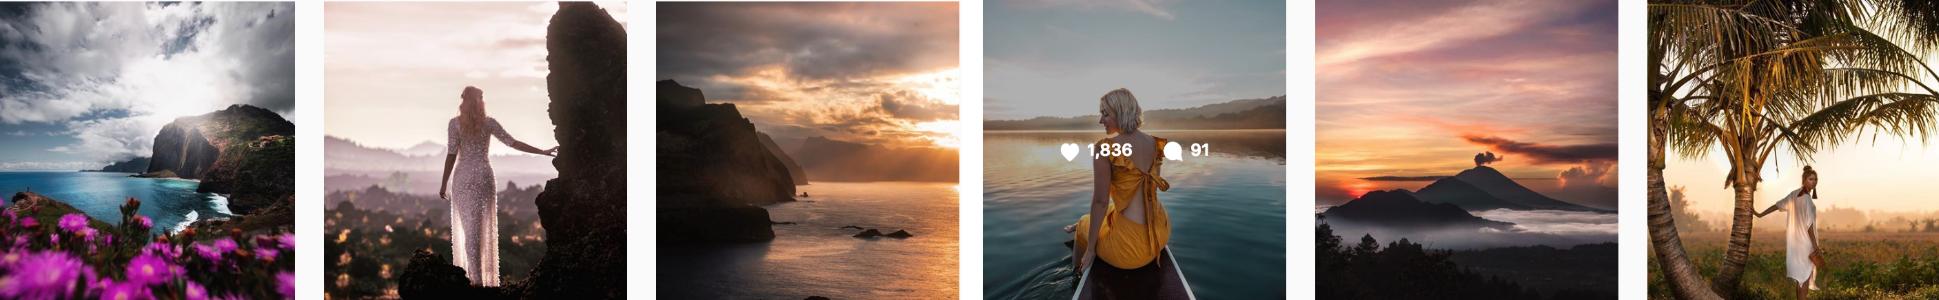 Emilio Kuzma-Floyd Instagram